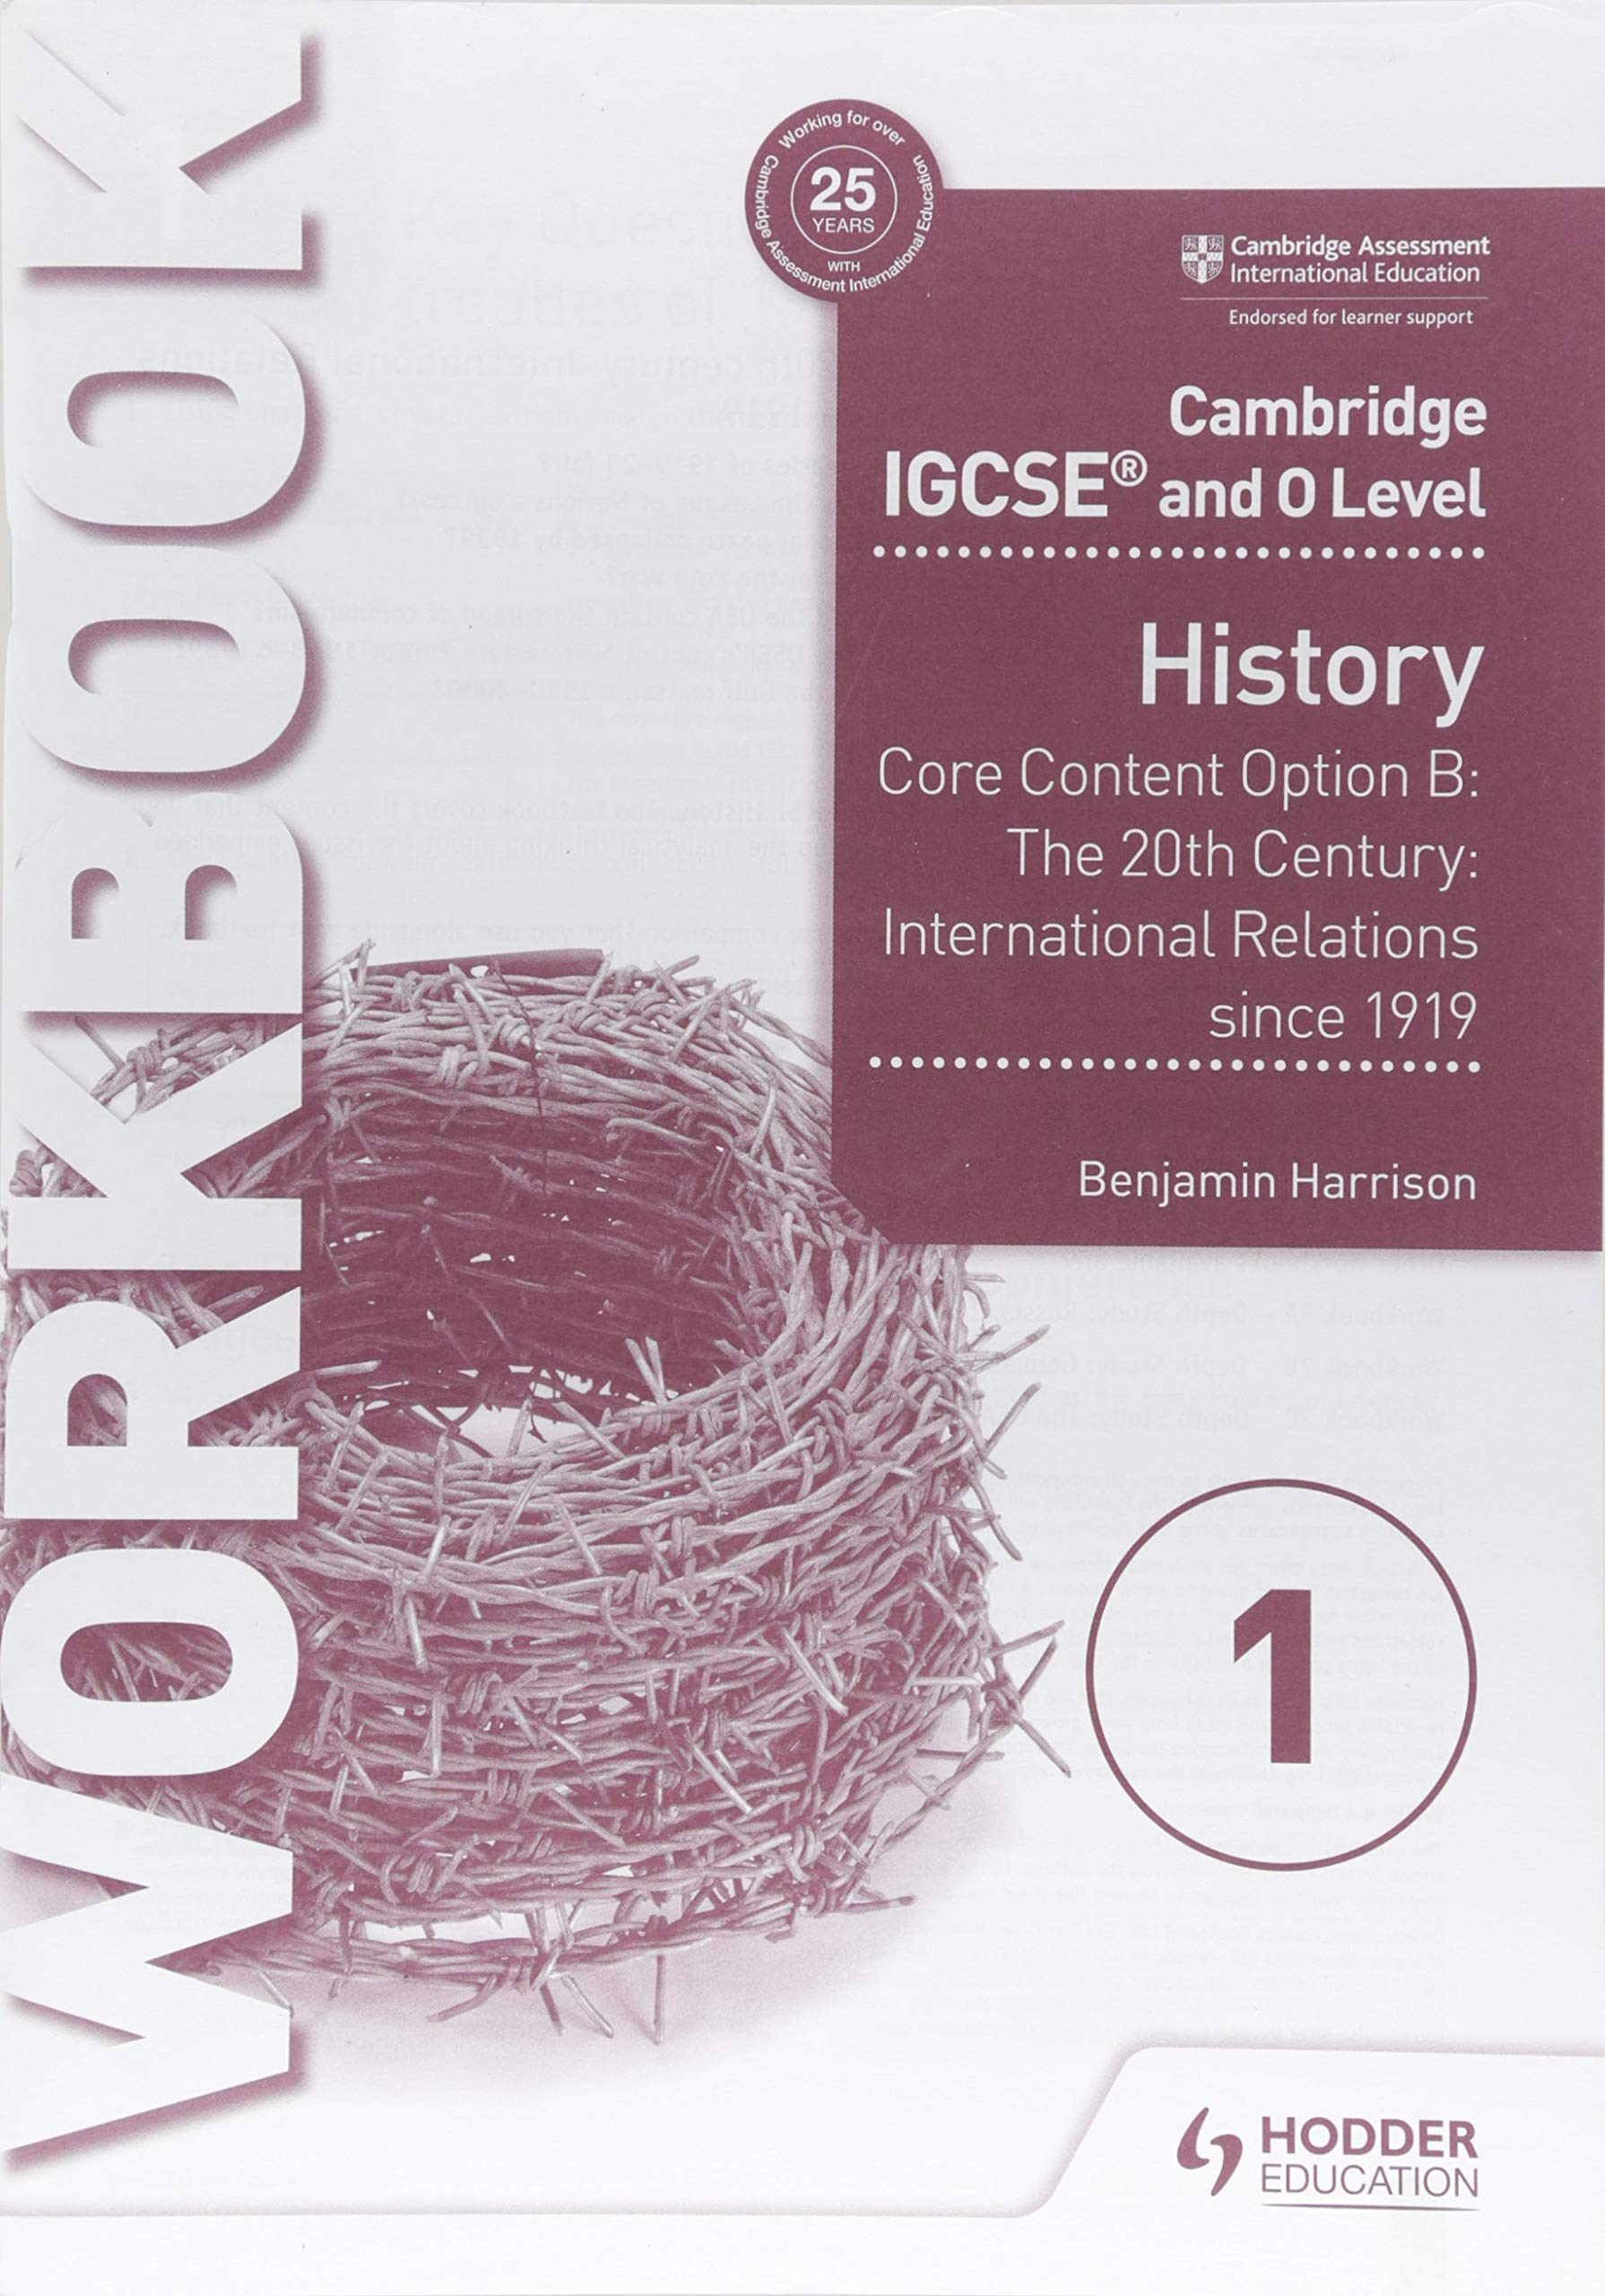 Cambridge IGCSE And O Level History Workbook 1   Core Content Option B  The 20th Century  International Relations Since 1919  Cambridge Igcse And O Level